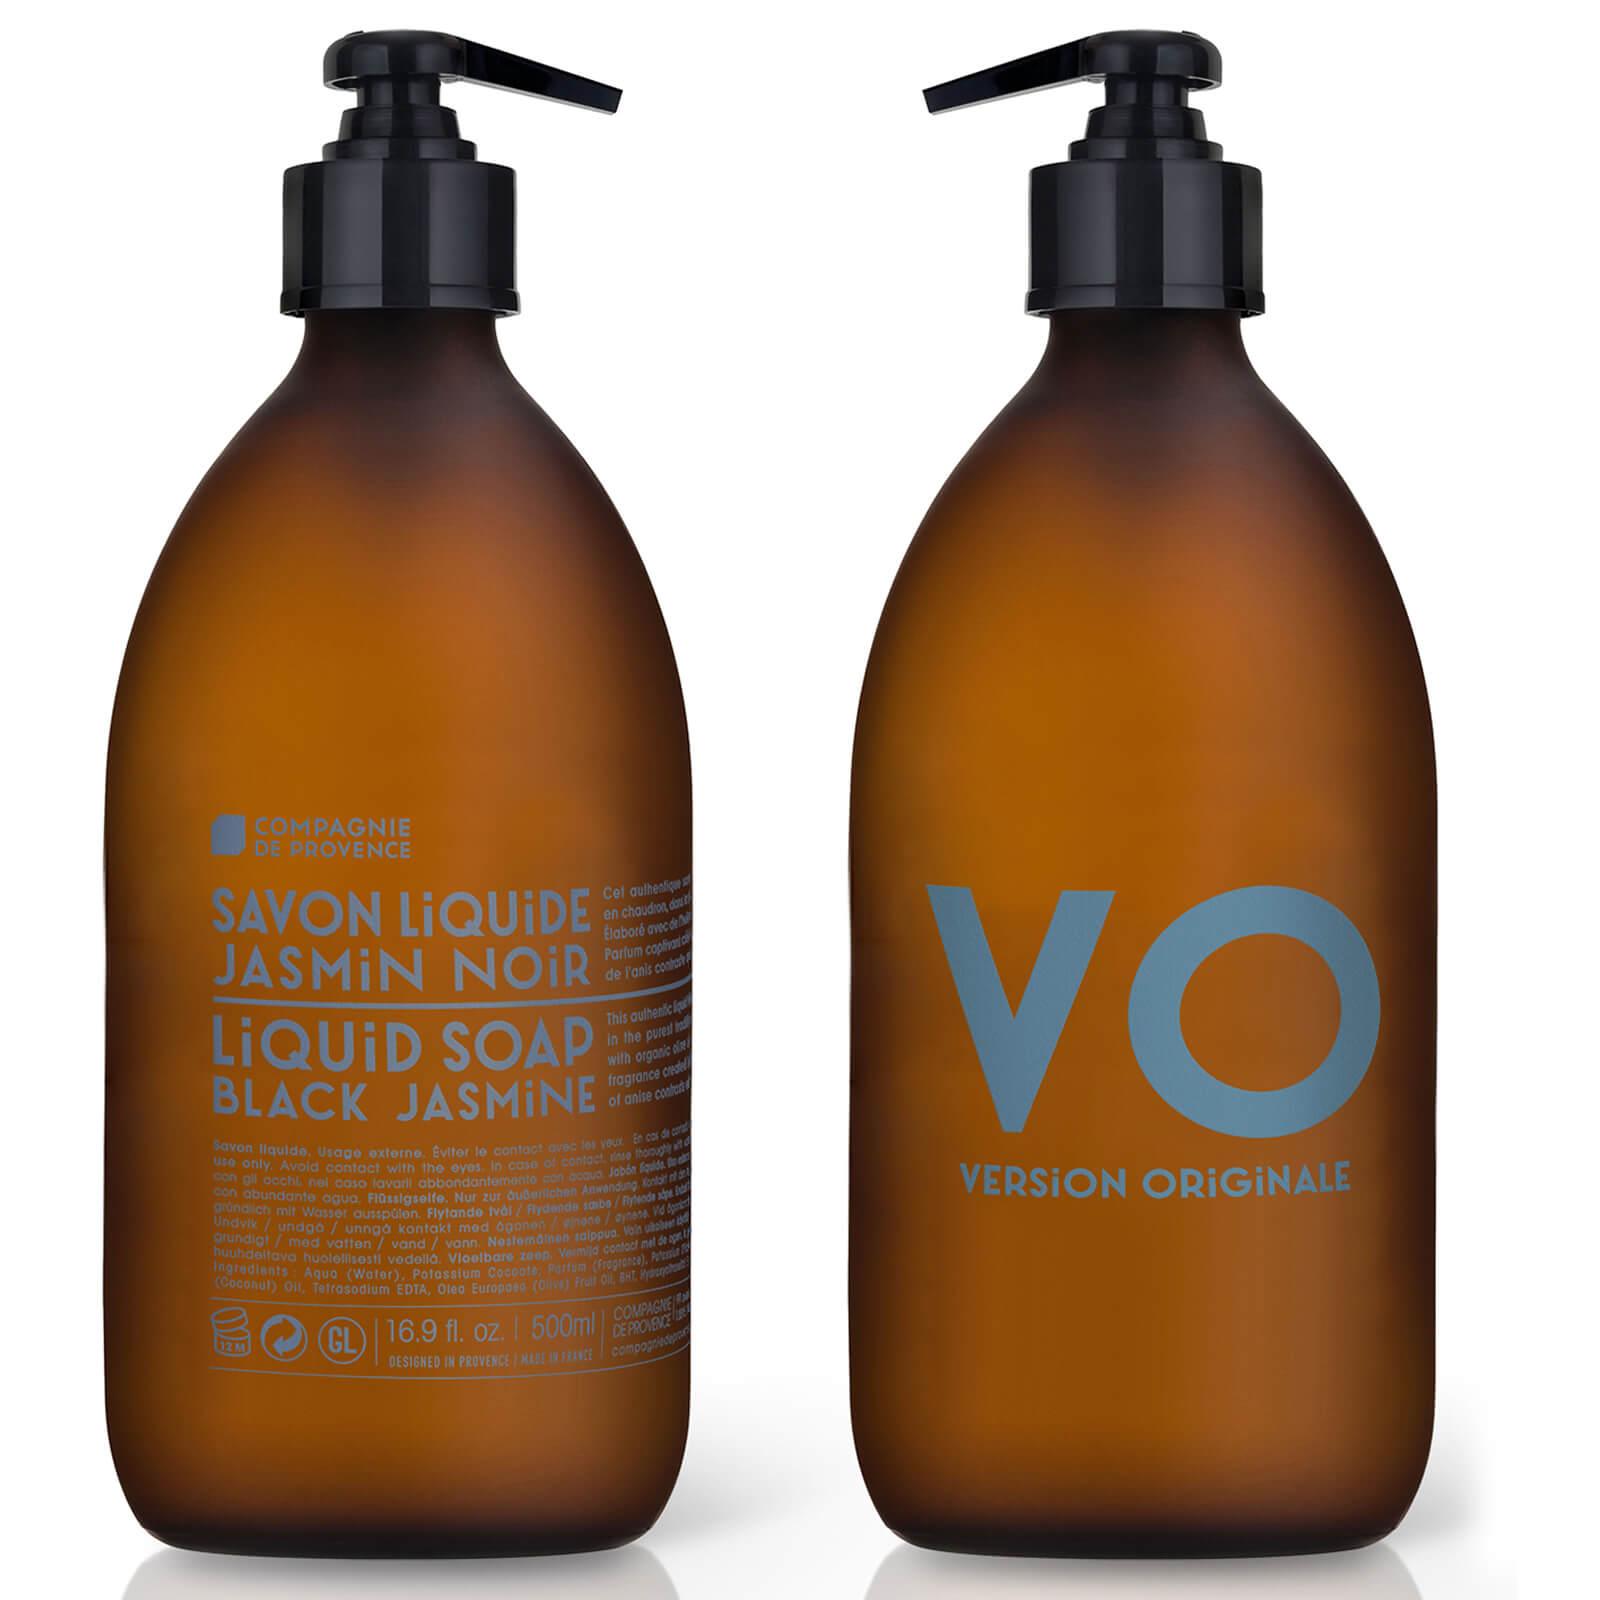 Купить Жидкое мыло Compagnie de Provence Liquid Marseille Soap 500 мл - Black Jasmine